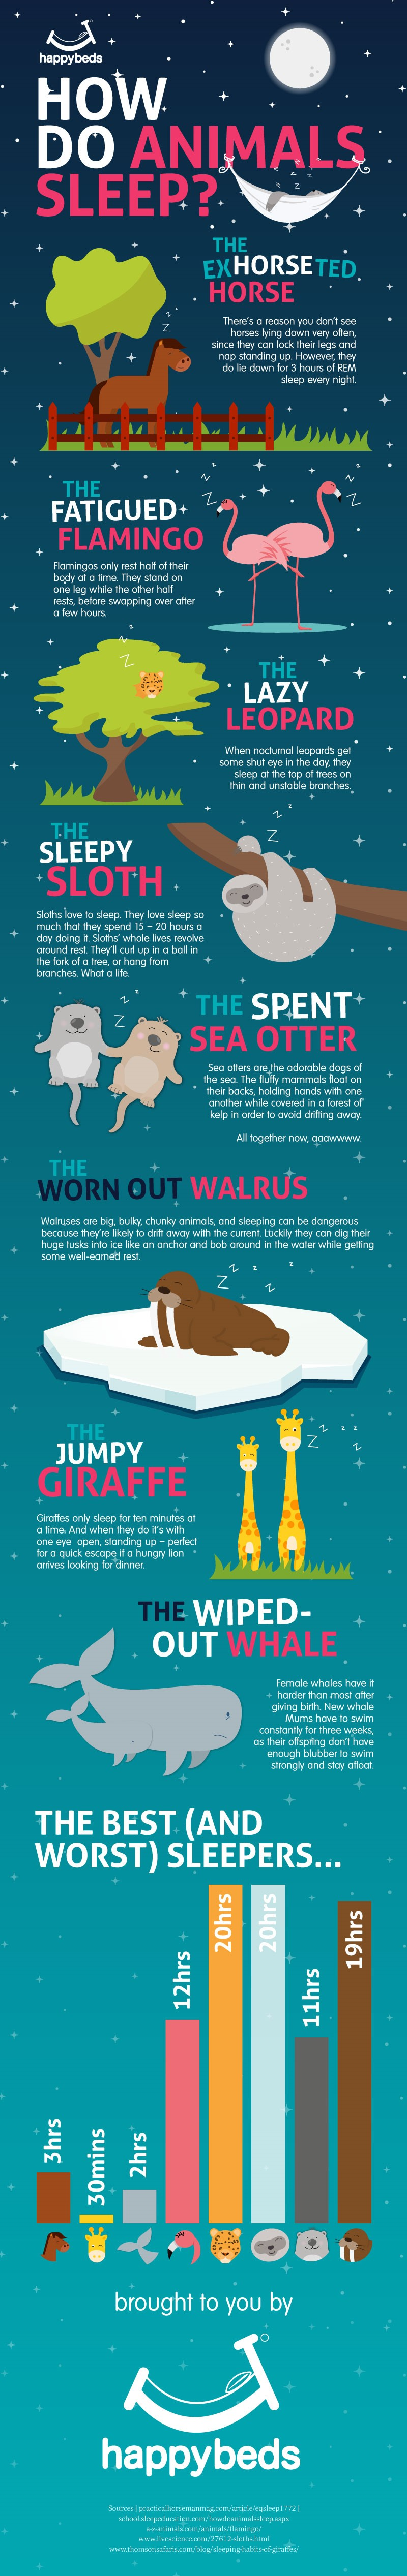 Sleeping Patterns Of Animals - Infographic